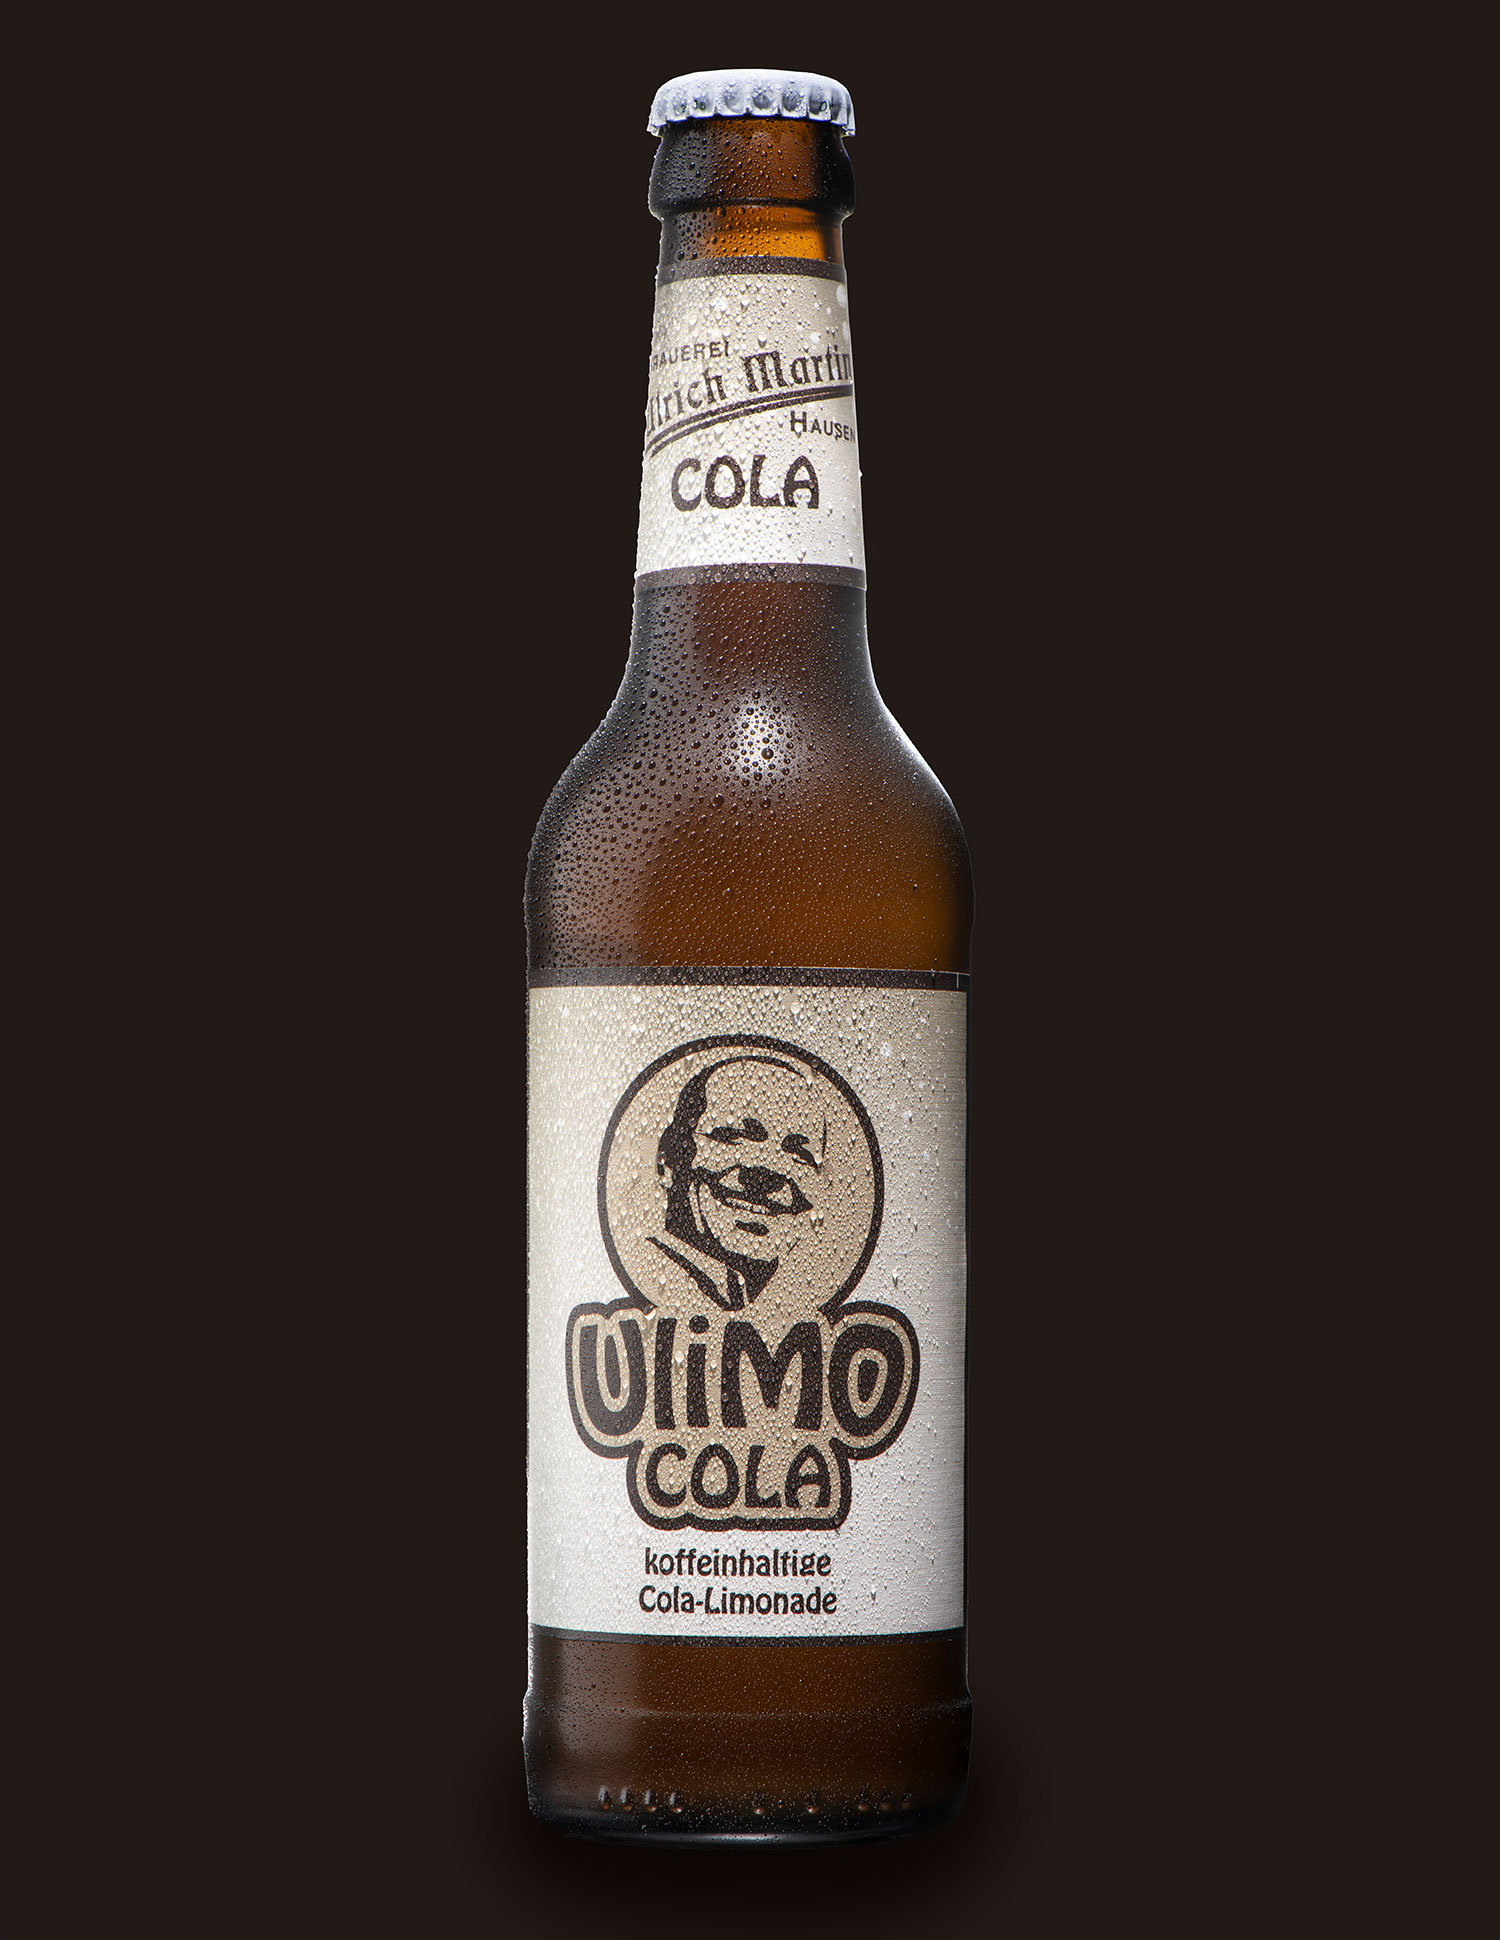 Ulimo Cola - koffeinhaltige Cola-Limonade